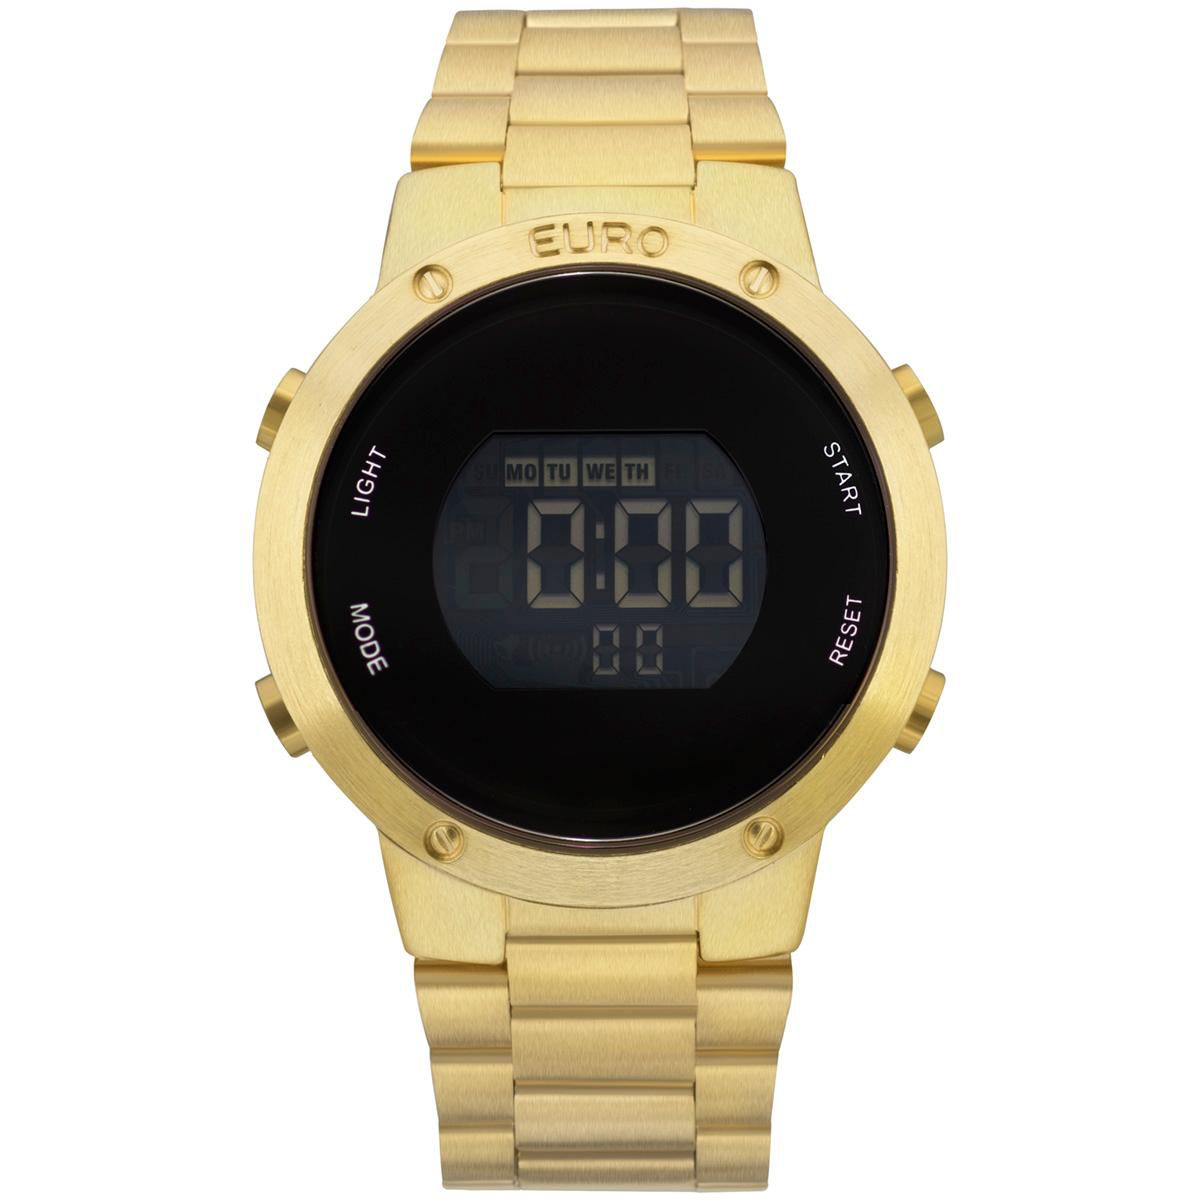 Relógio Feminino Euro Fashion Fit EUBJ3279AA/4D 44mm Digital Aço Dourado